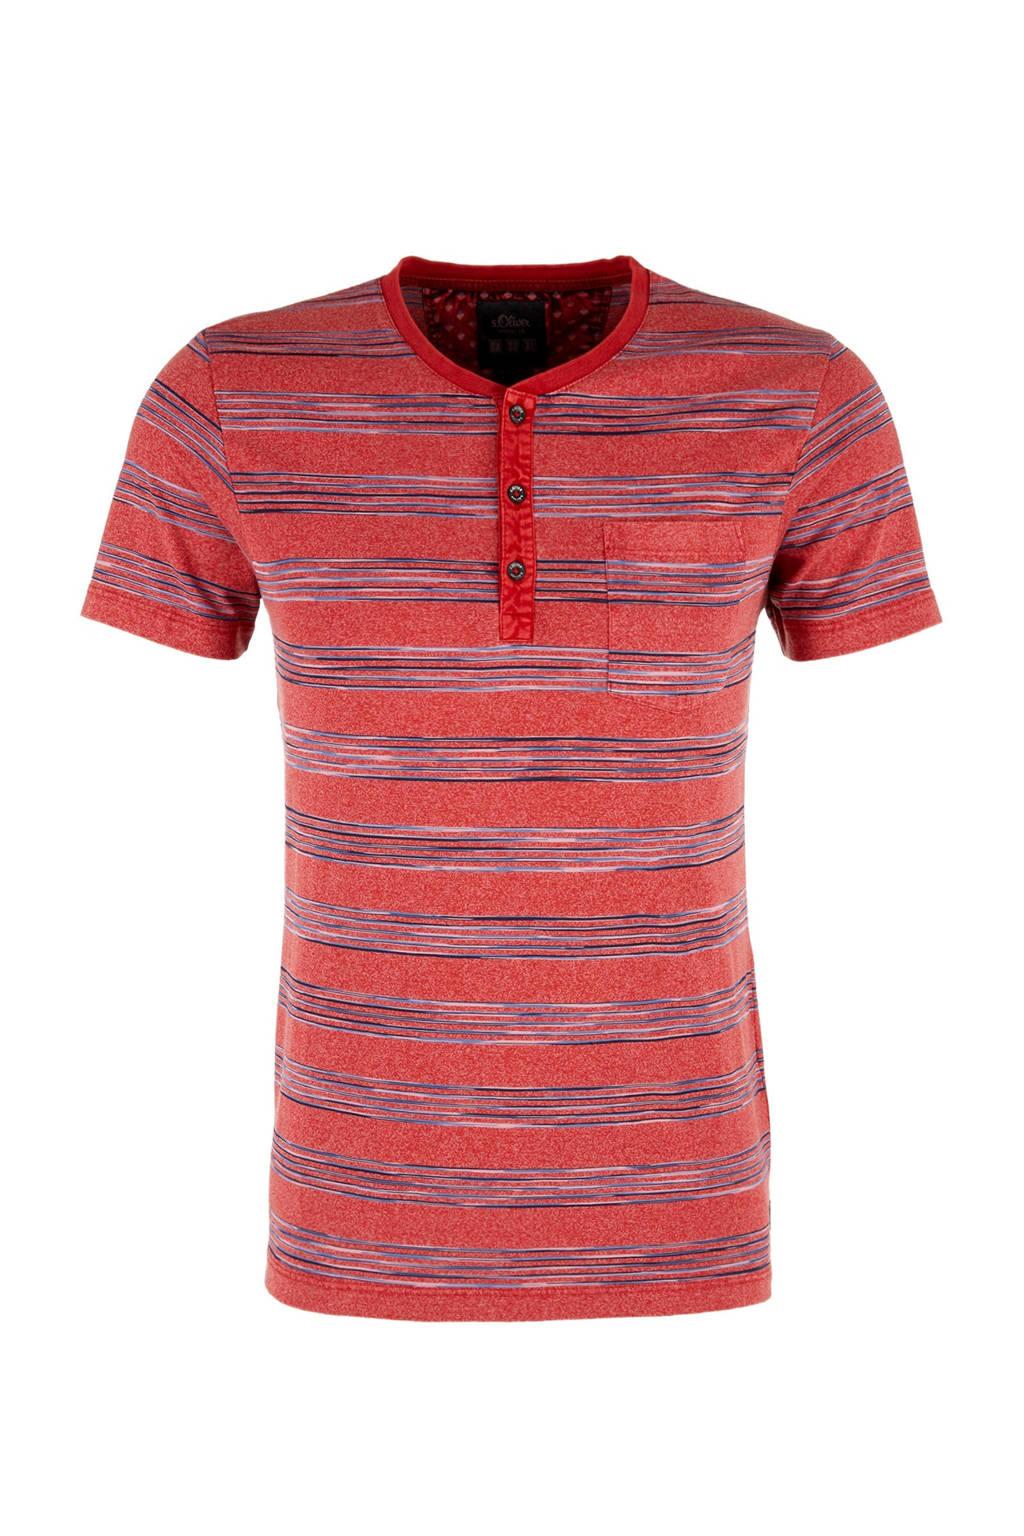 s.Oliver T-shirt, Rood